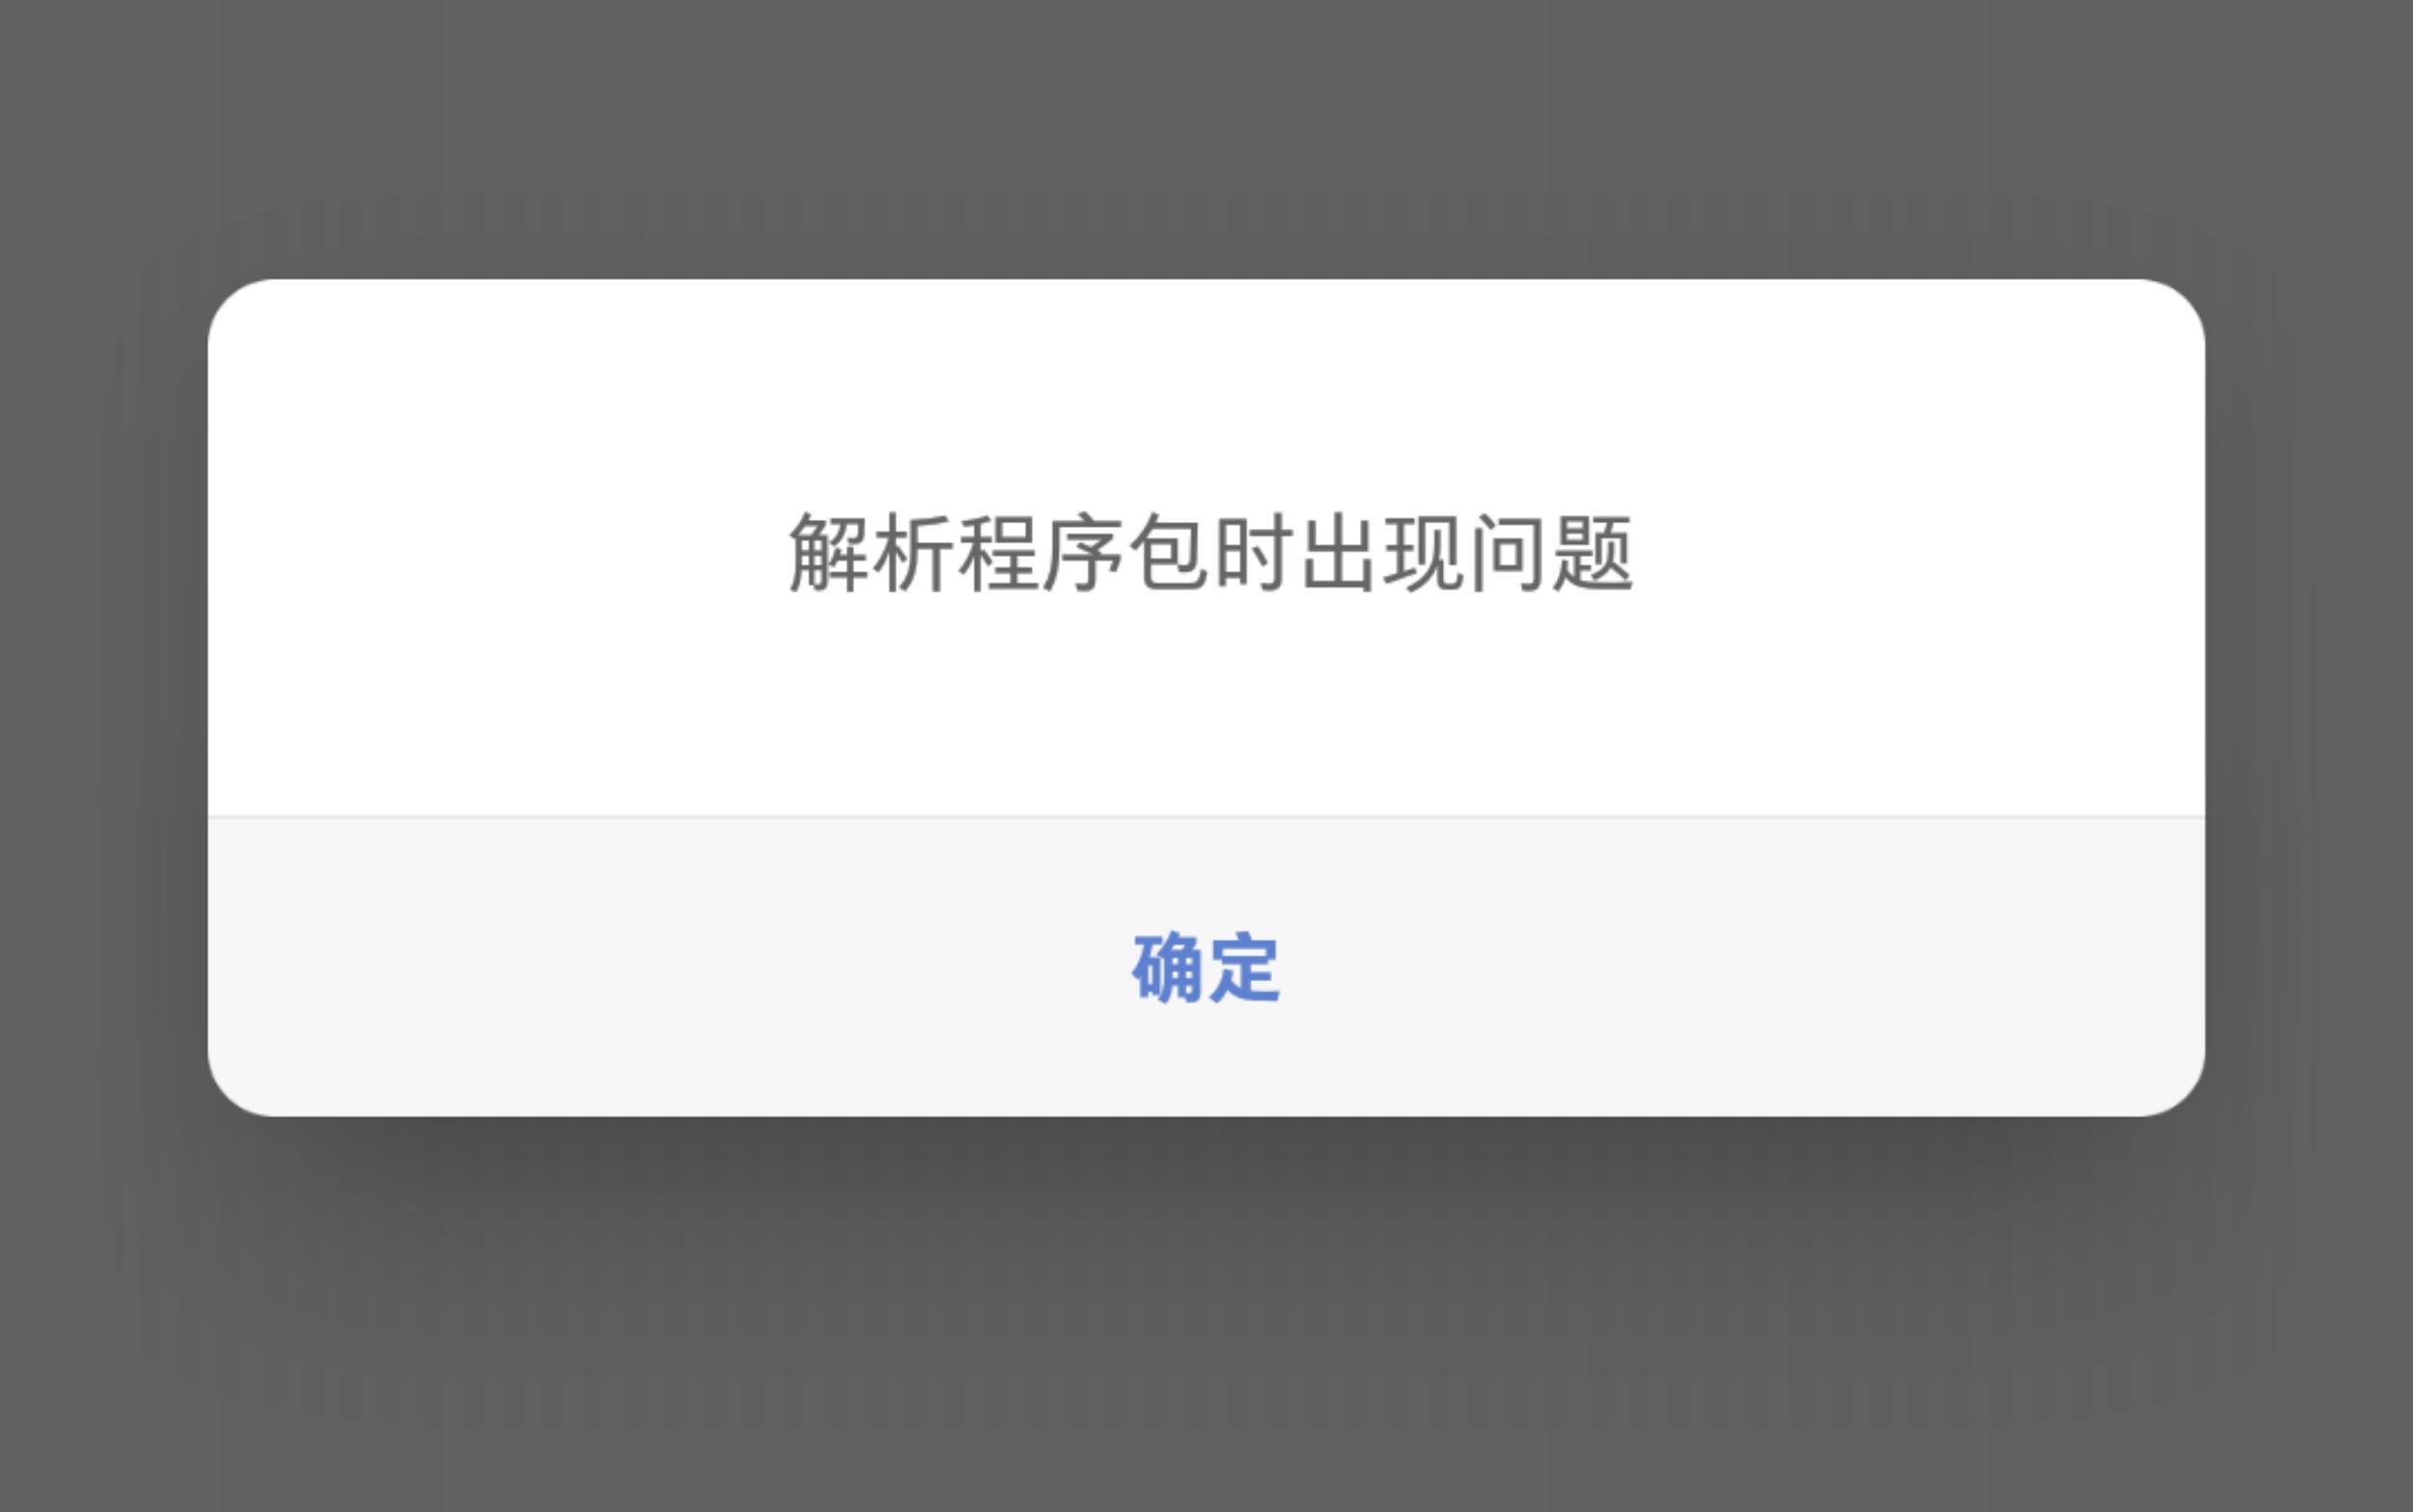 Screenshot_2020-12-03-22-51-59-777_?????.png